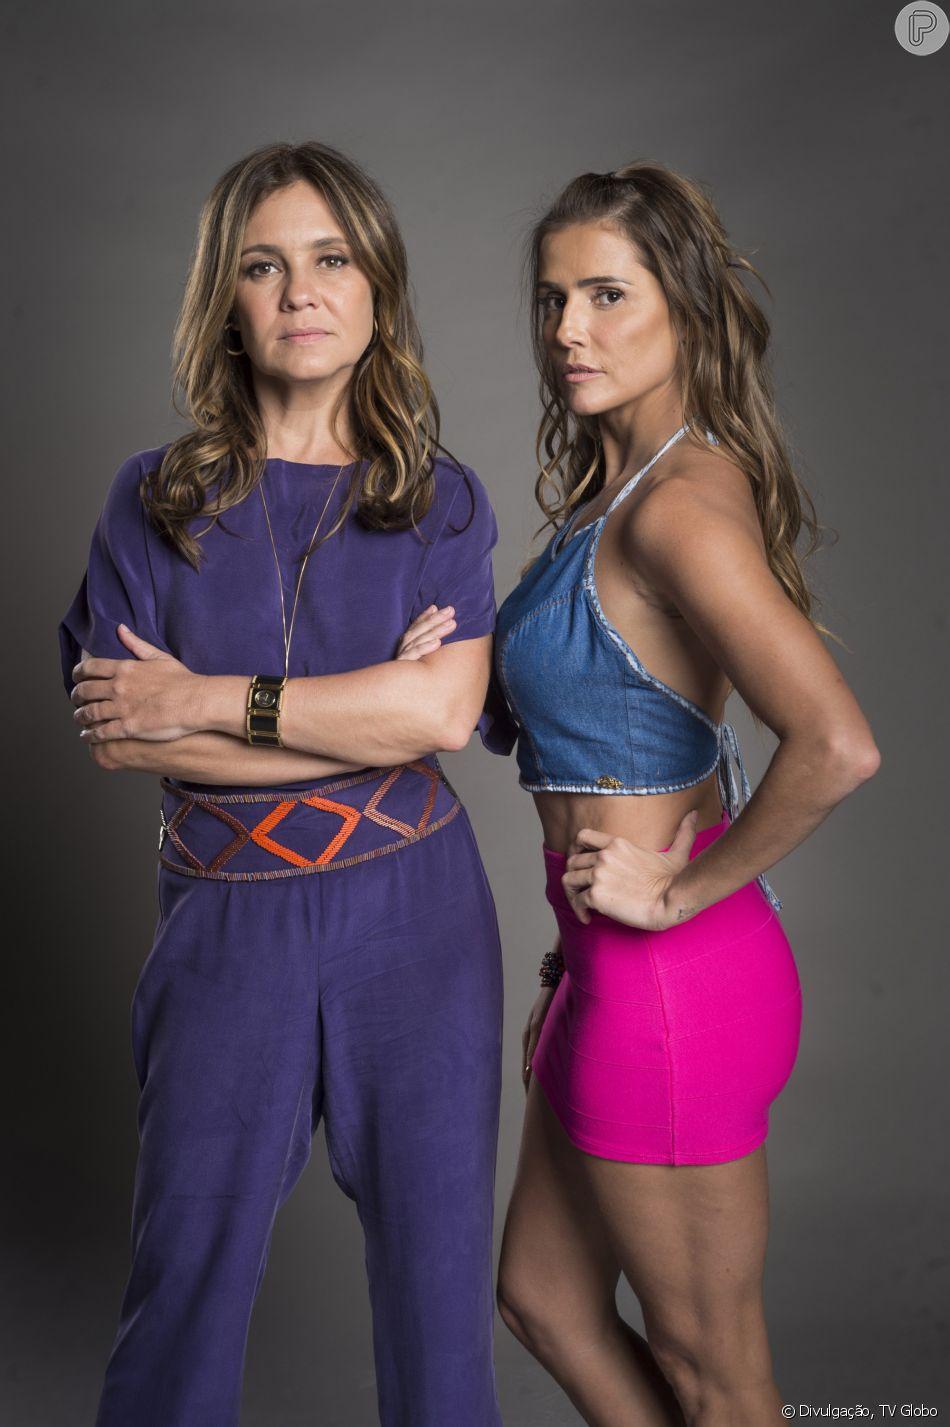 Karola (Deborah Secco) é morta pela mãe, Laureta (Adriana Esteves), na novela 'Segundo Sol', em 1º de novembro de 2018